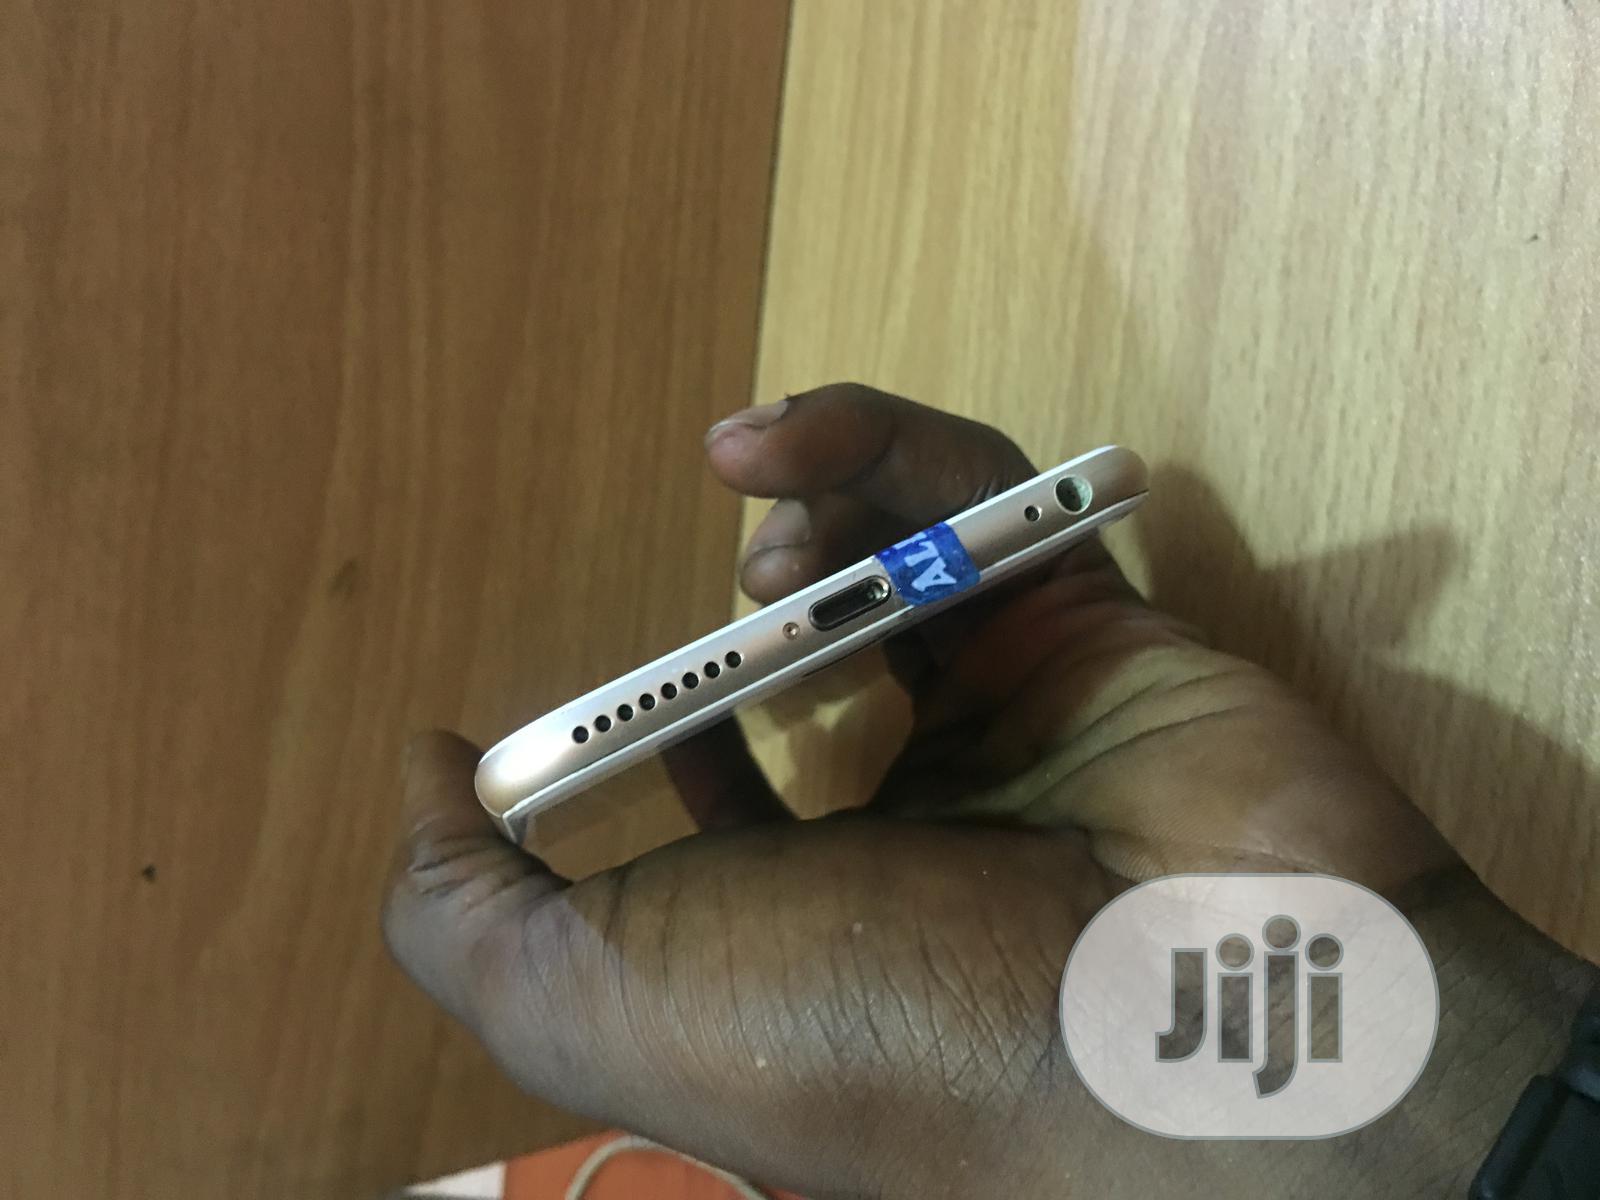 Apple iPhone 6s Plus 32 GB Gold   Mobile Phones for sale in Ikpoba-Okha, Edo State, Nigeria